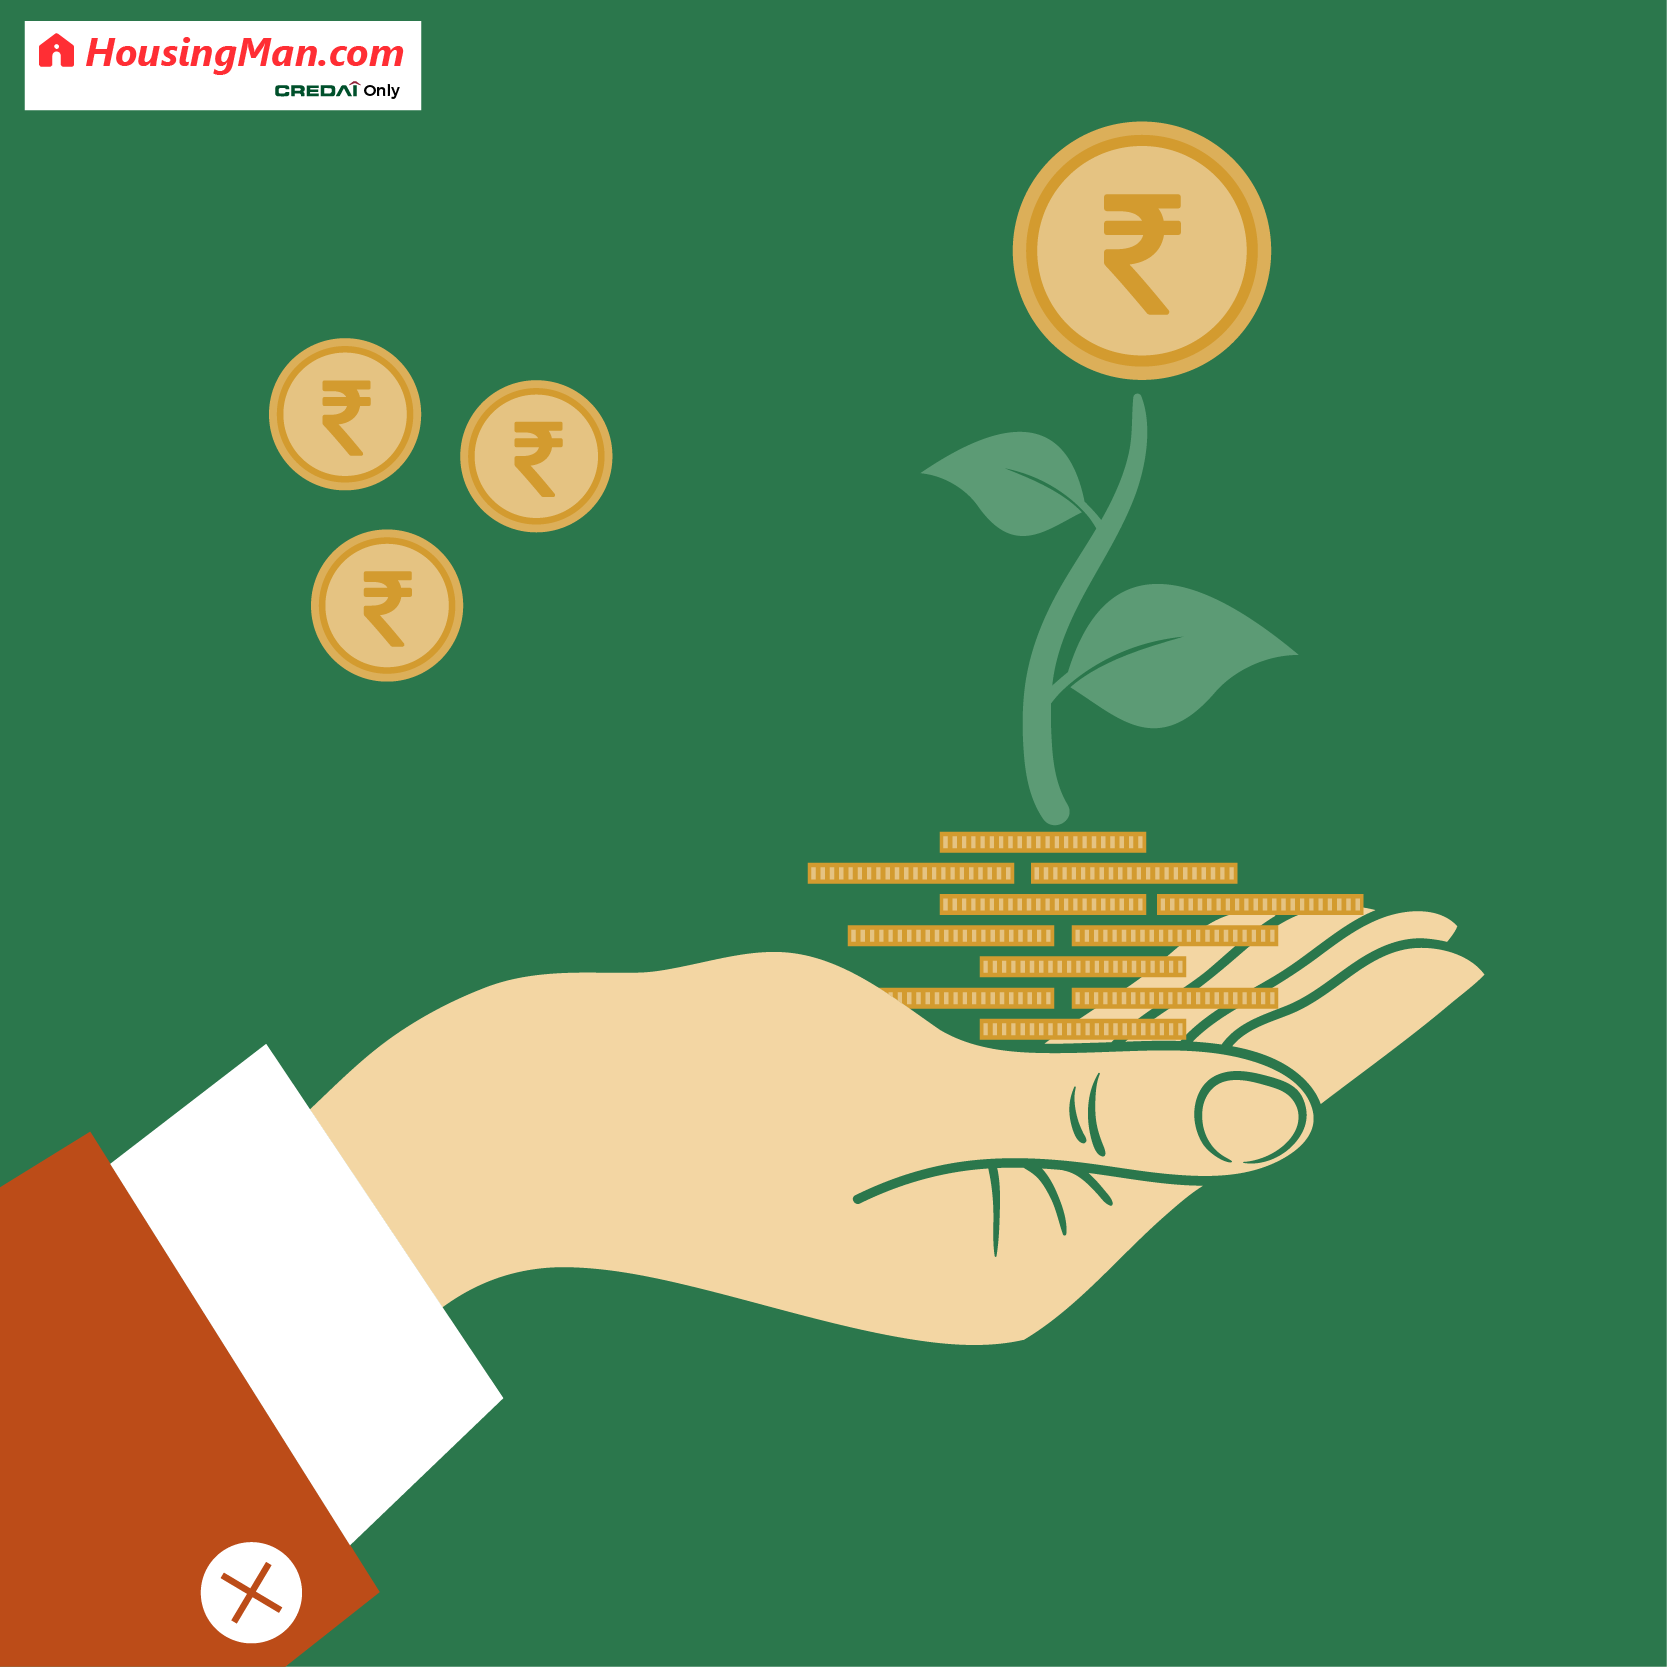 Money saving tips form HousingMan